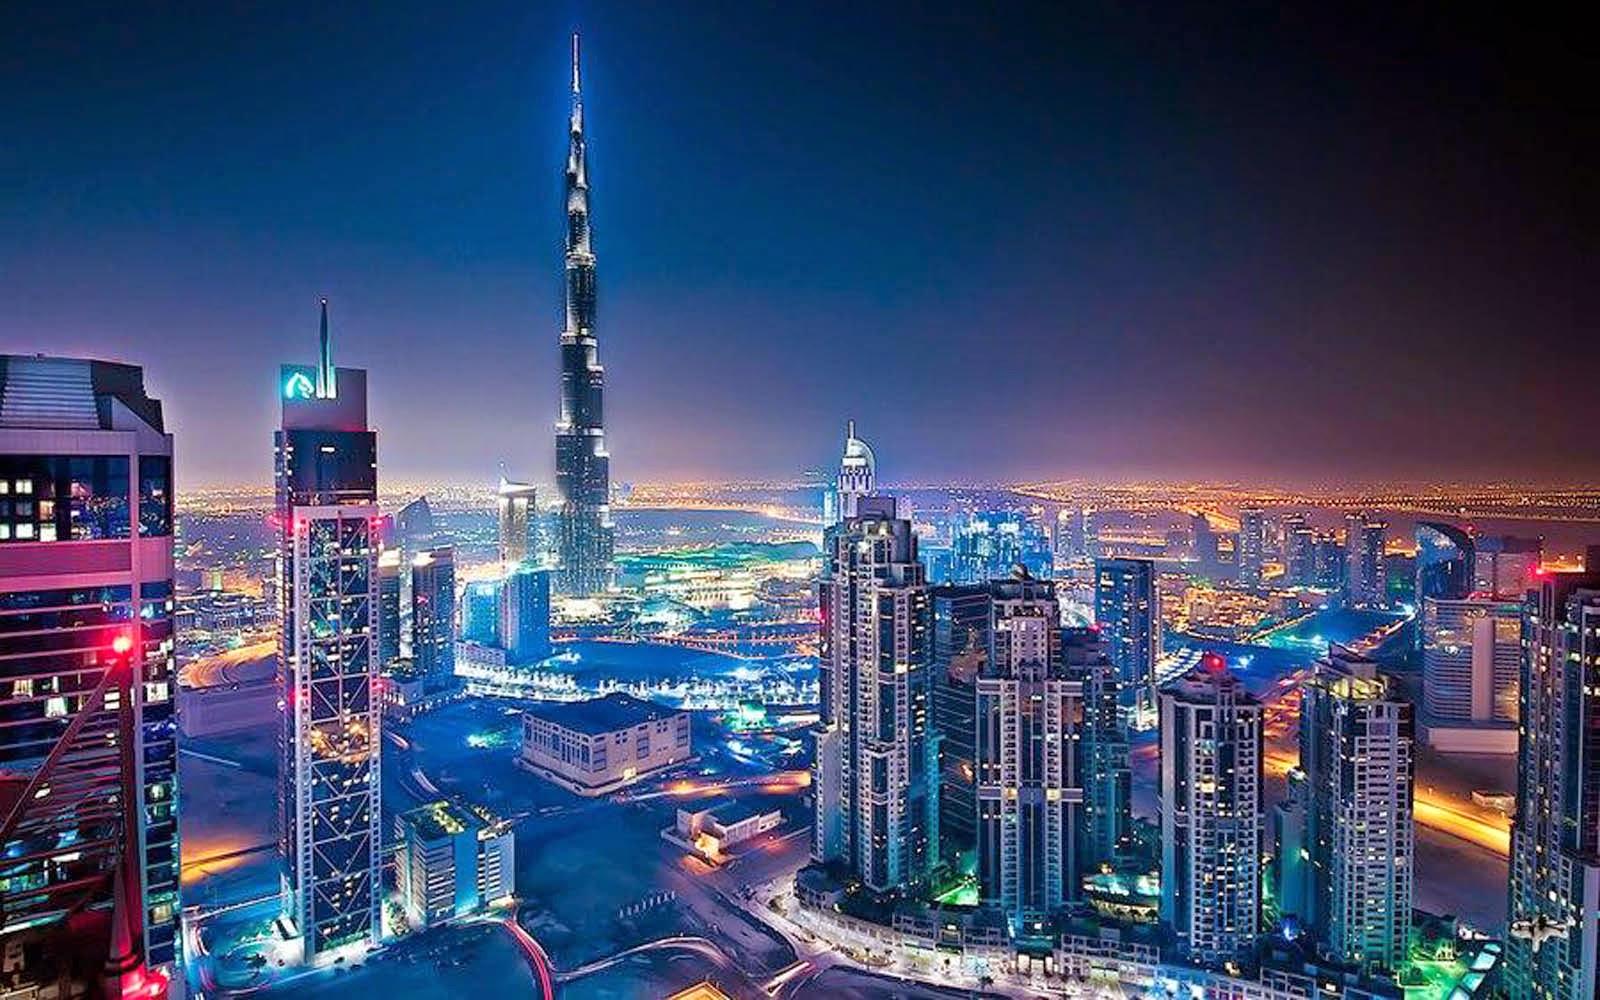 Burj Khalifa Hd Photos: Burj Khalifa At Night HD Desktop Wallpaper : Widescreen